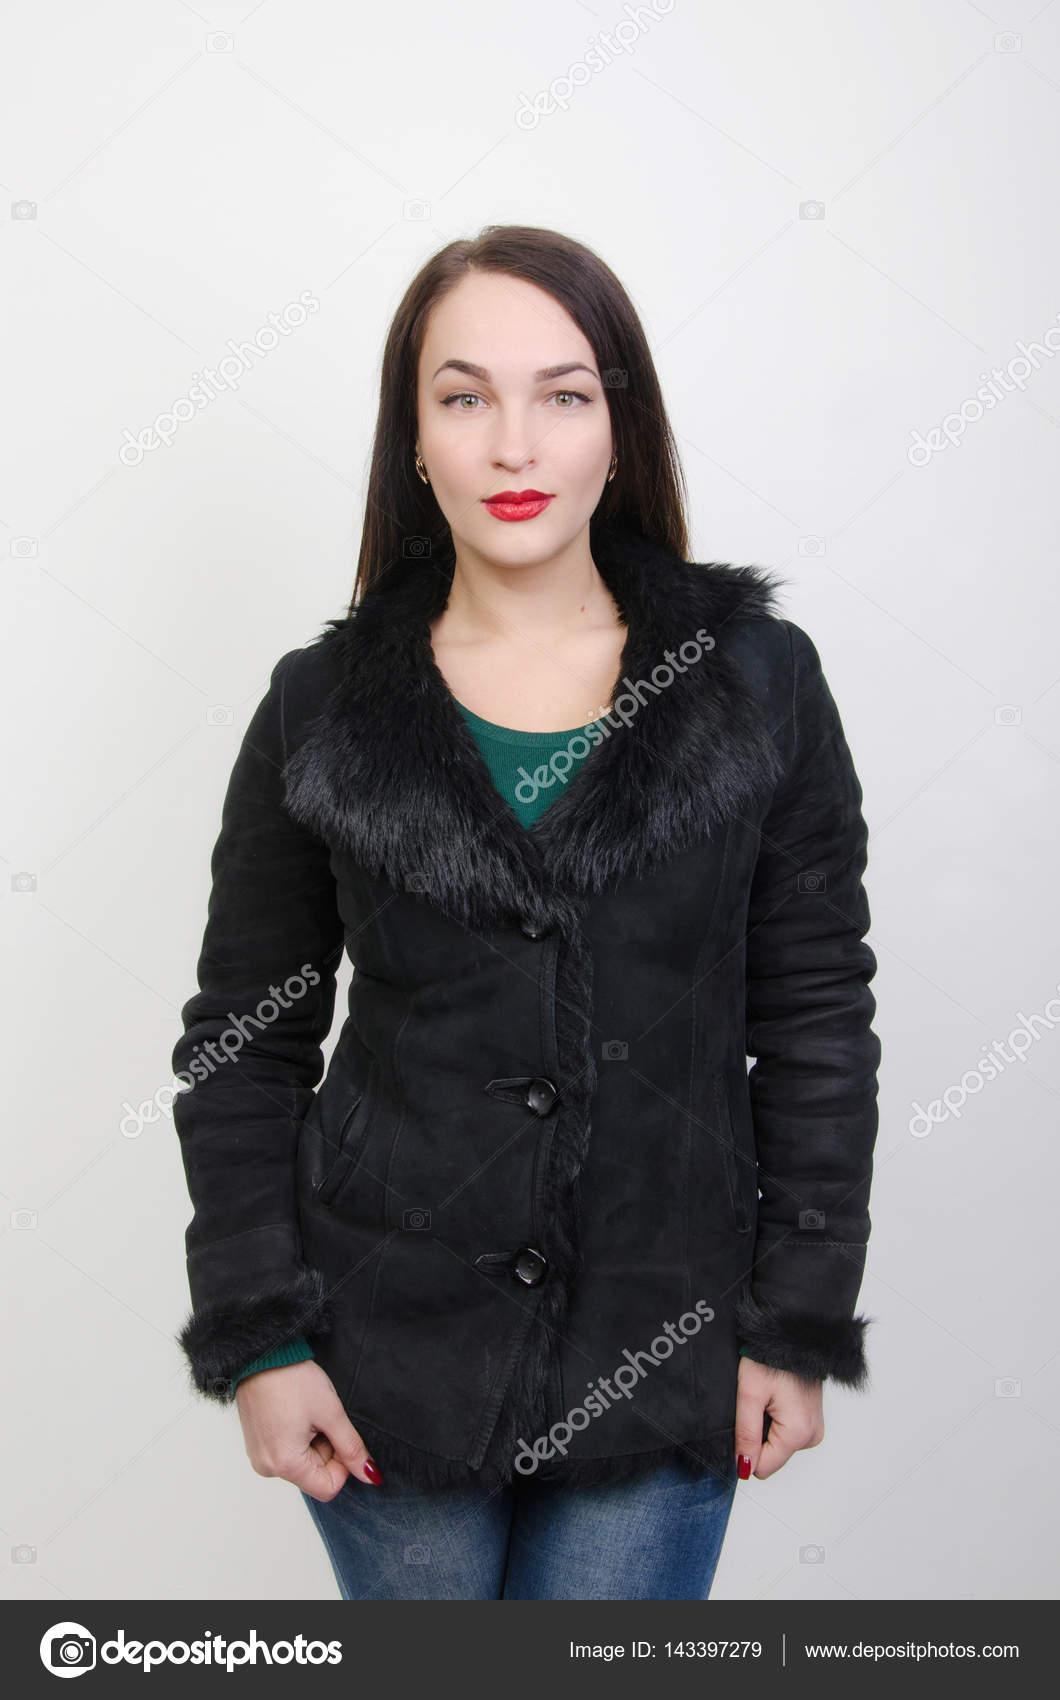 16100425055e ... παλτό — Φωτογραφία Αρχείου · Γυναίκα ντυμένη χειμωνιάτικα ρούχα —  Εικόνα από ...